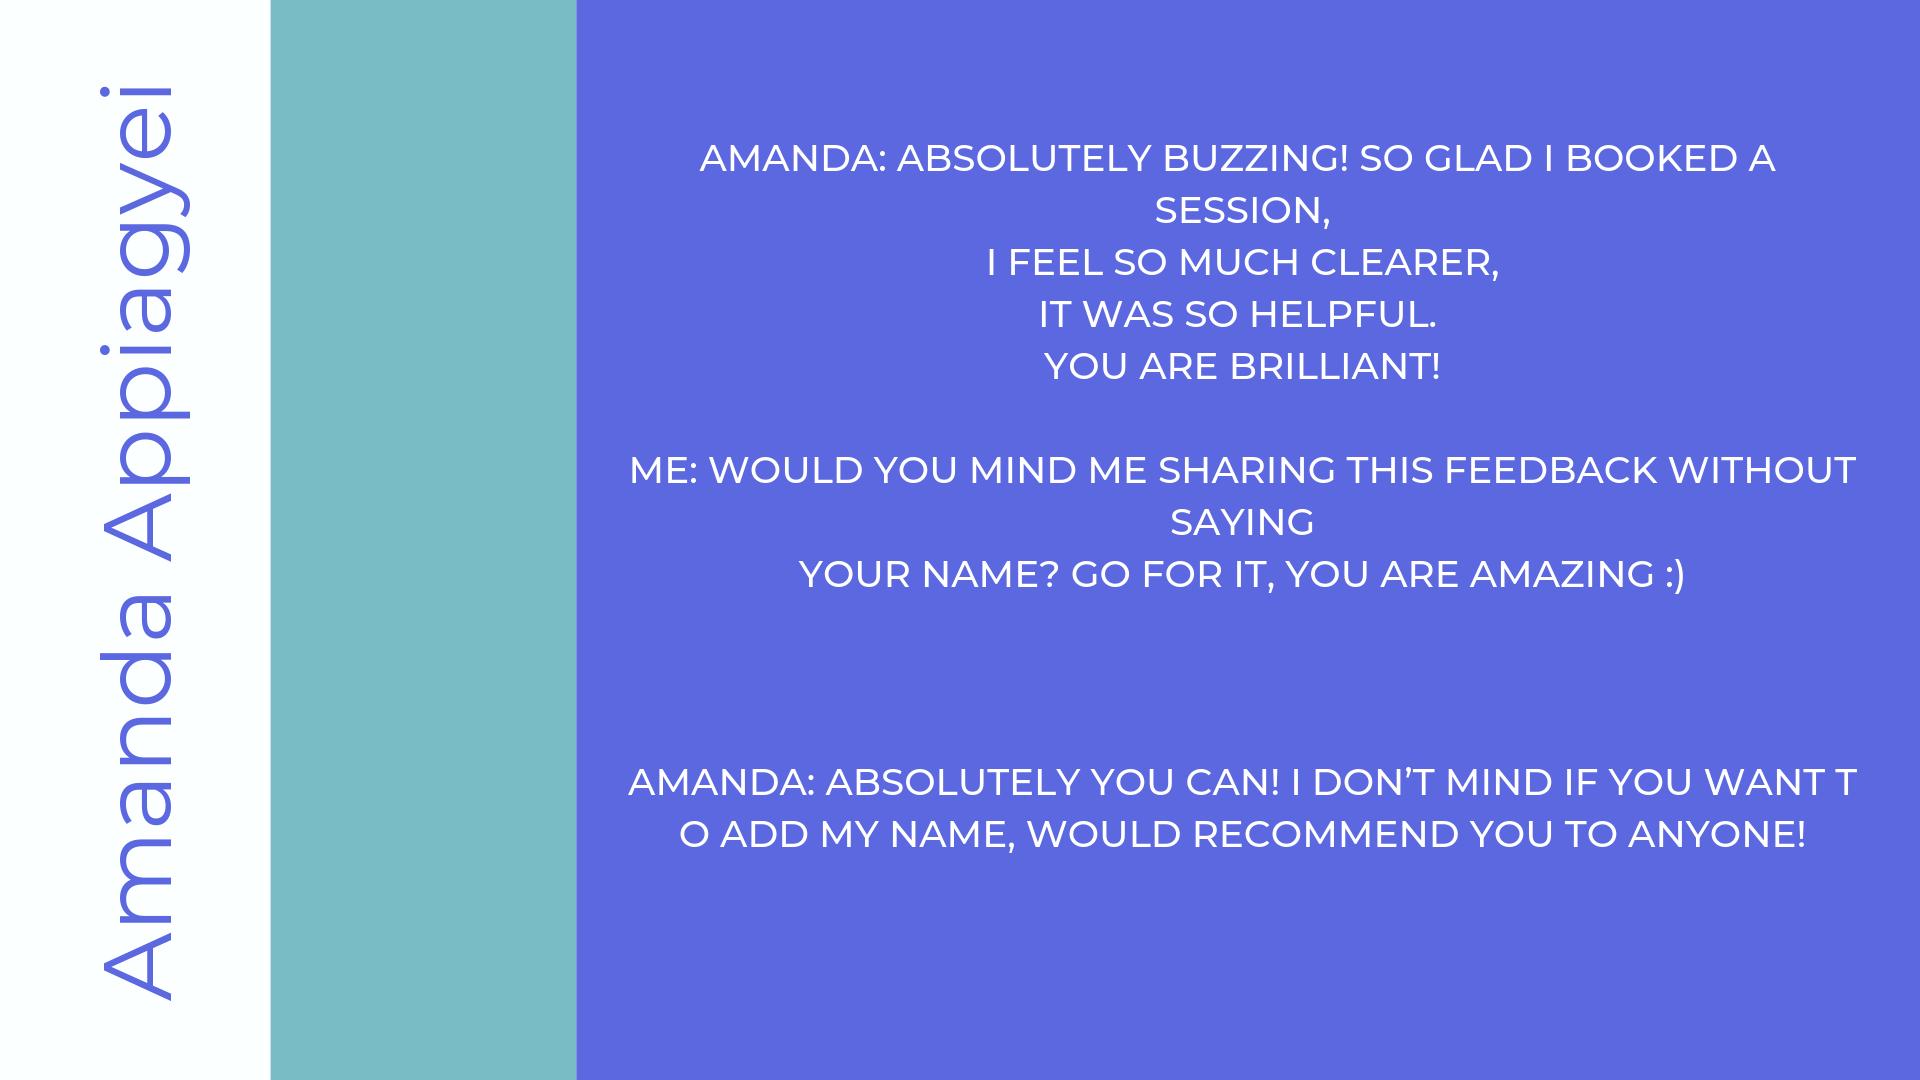 Amanda Appiagyei testmonial.png